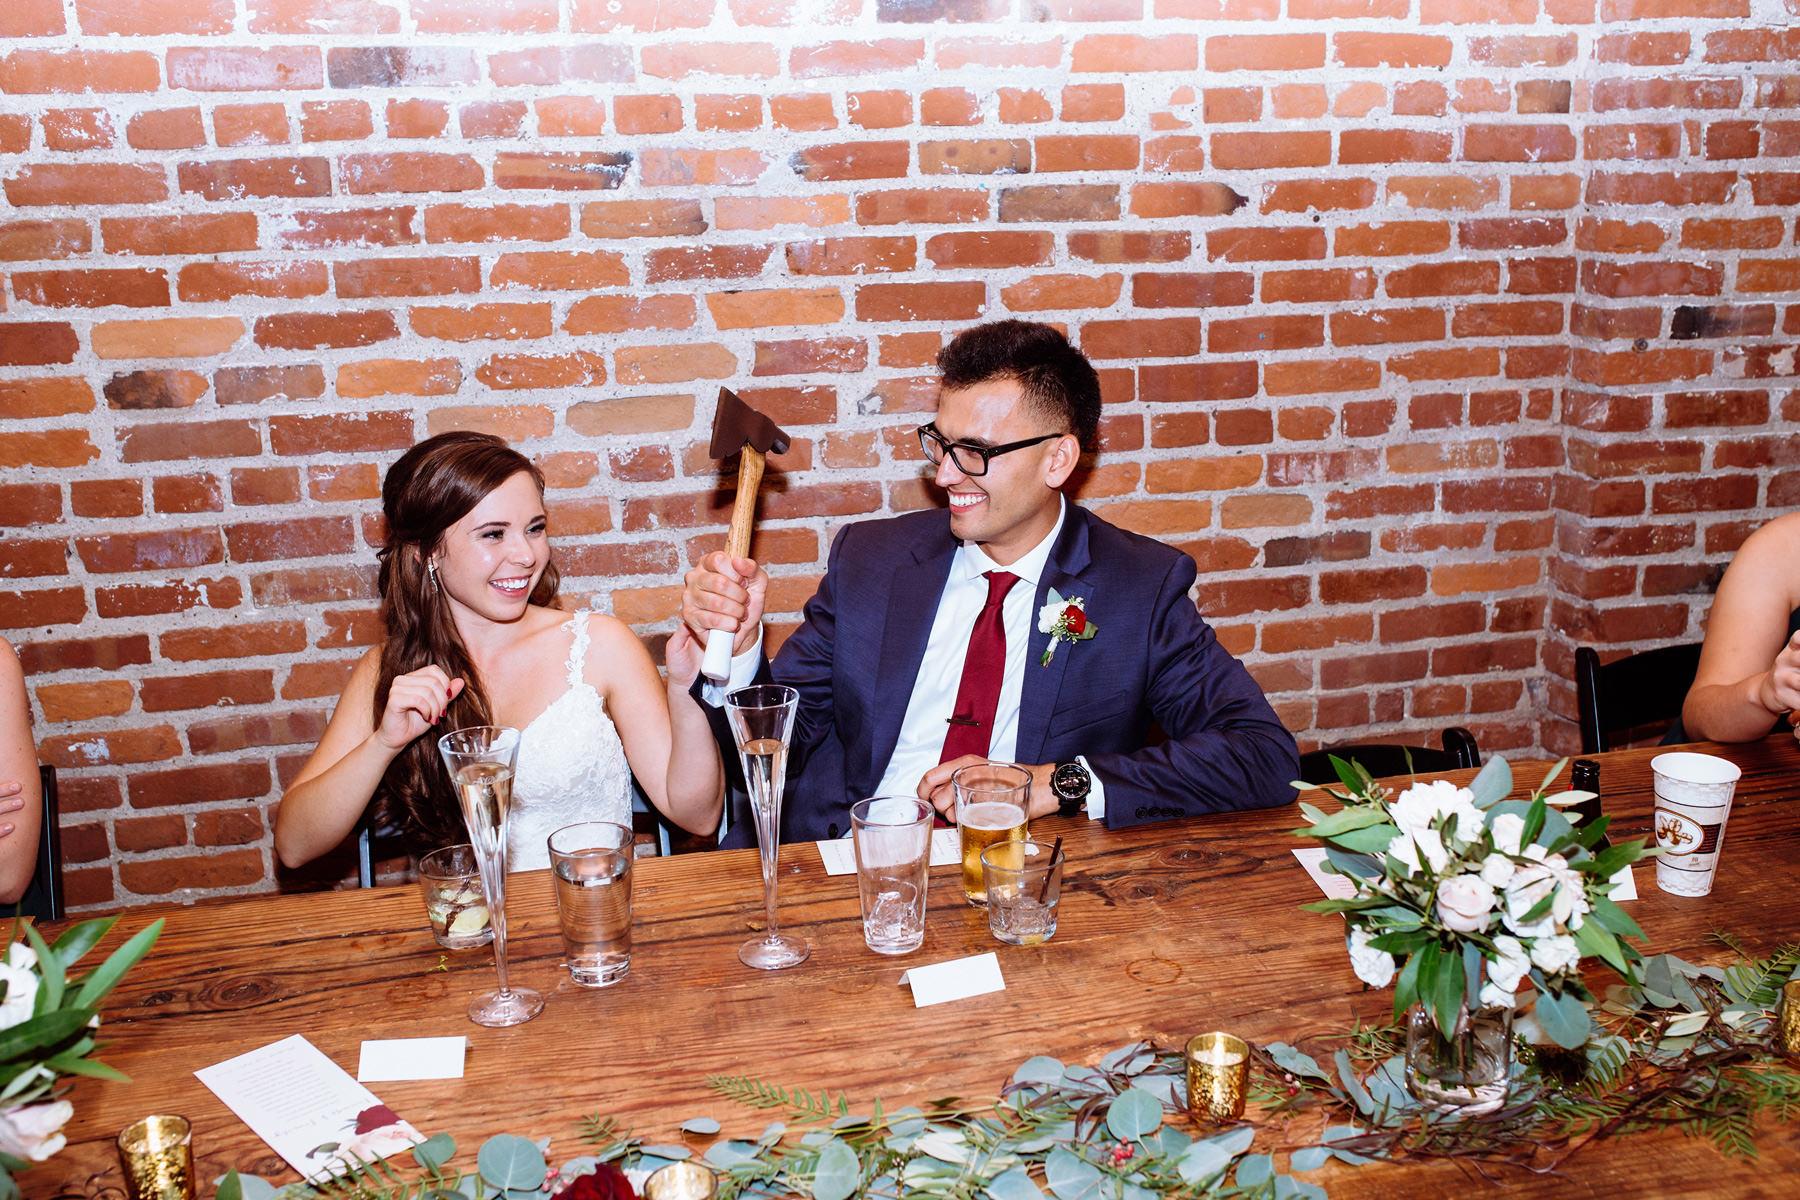 Kansas City Summer Wedding at the Guild_Kindling Wedding Photography Blog74.JPG